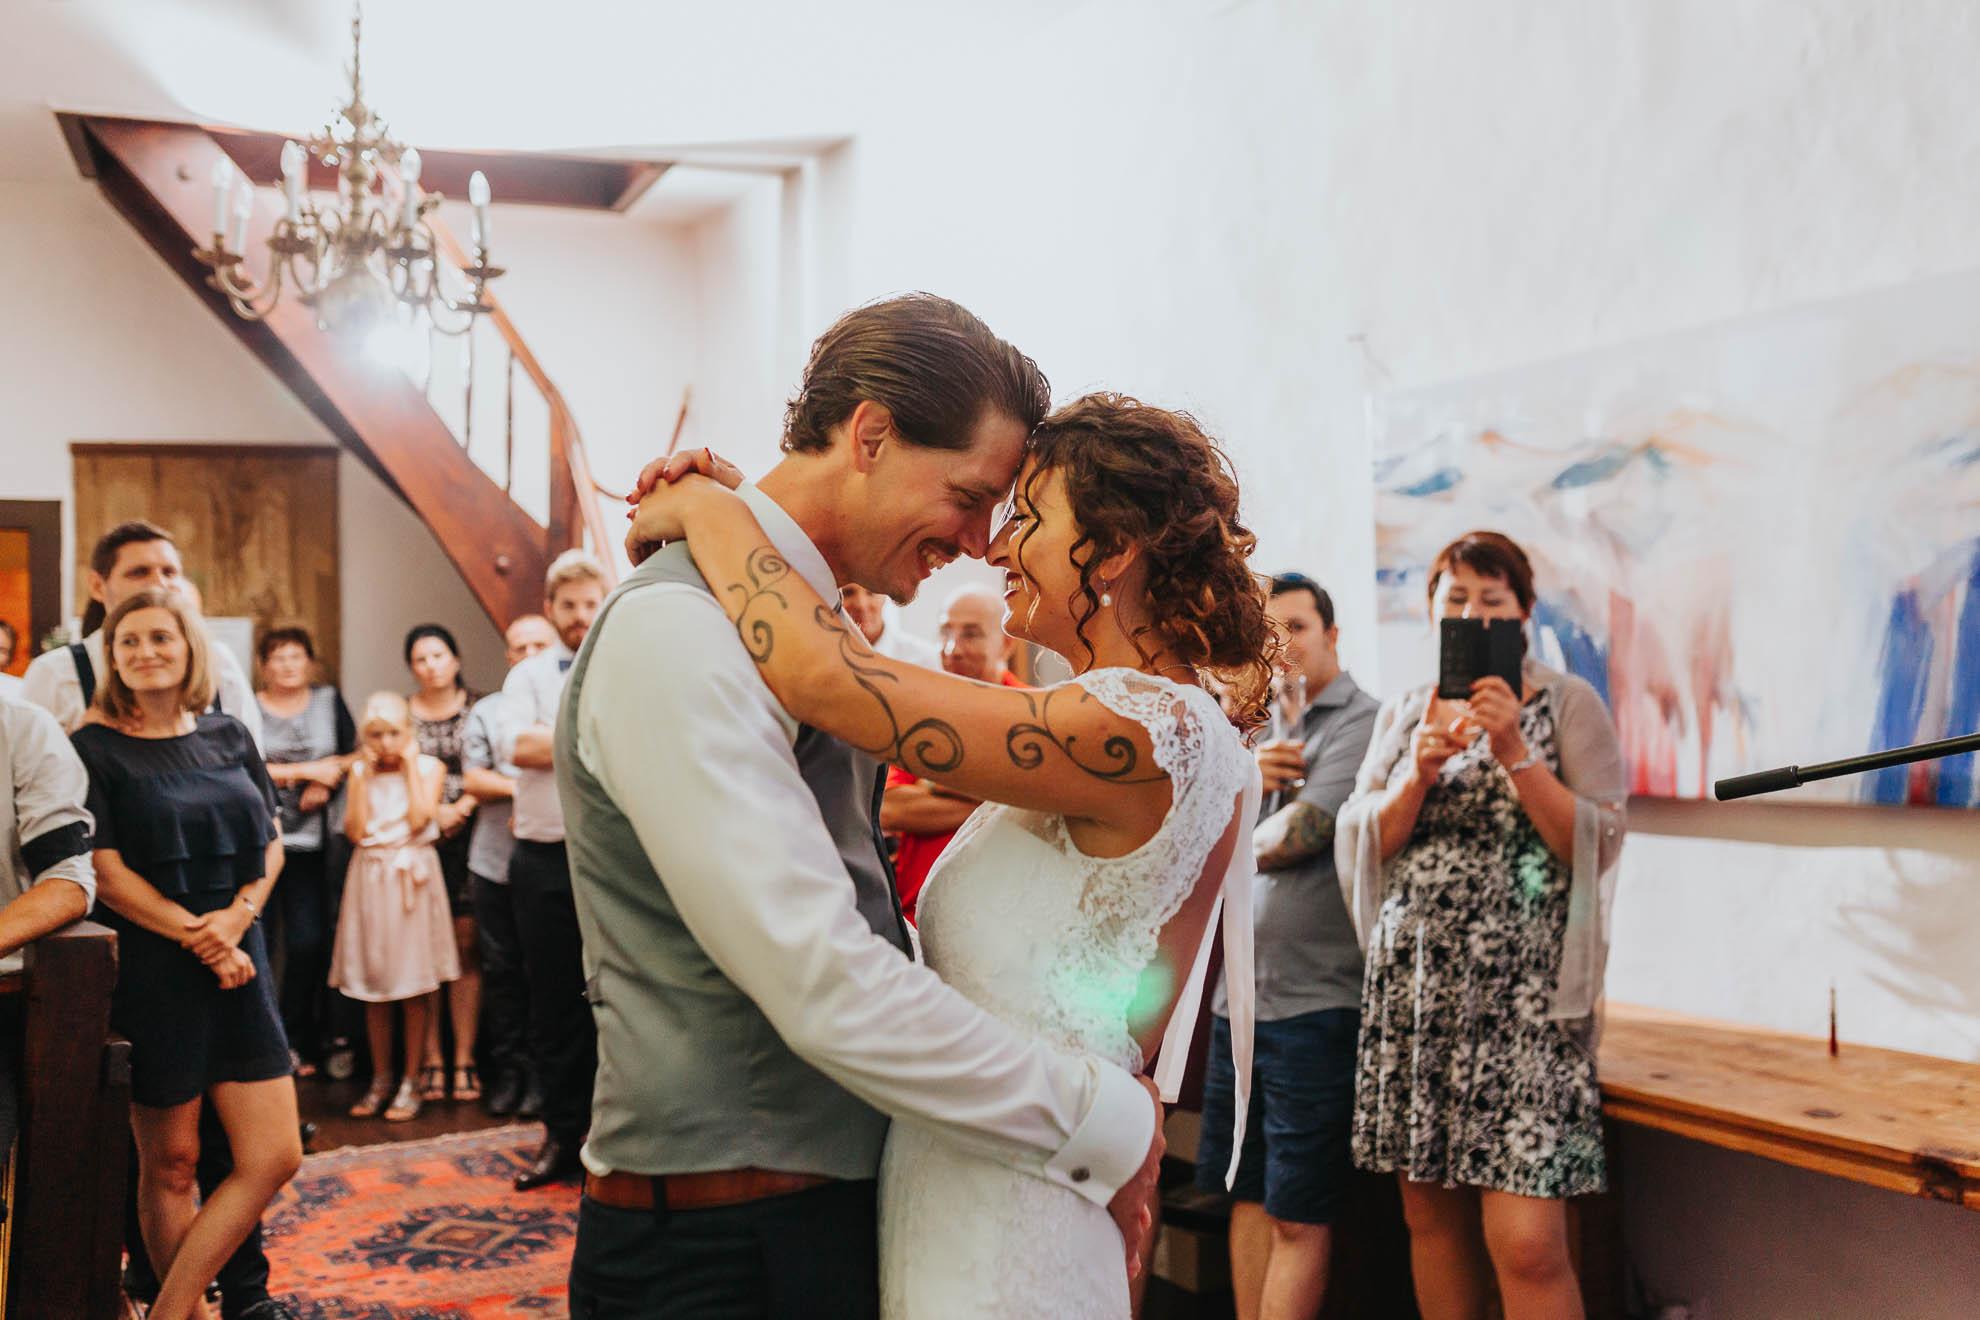 Hefti Impressions - Hochzeitsfotos & Videos